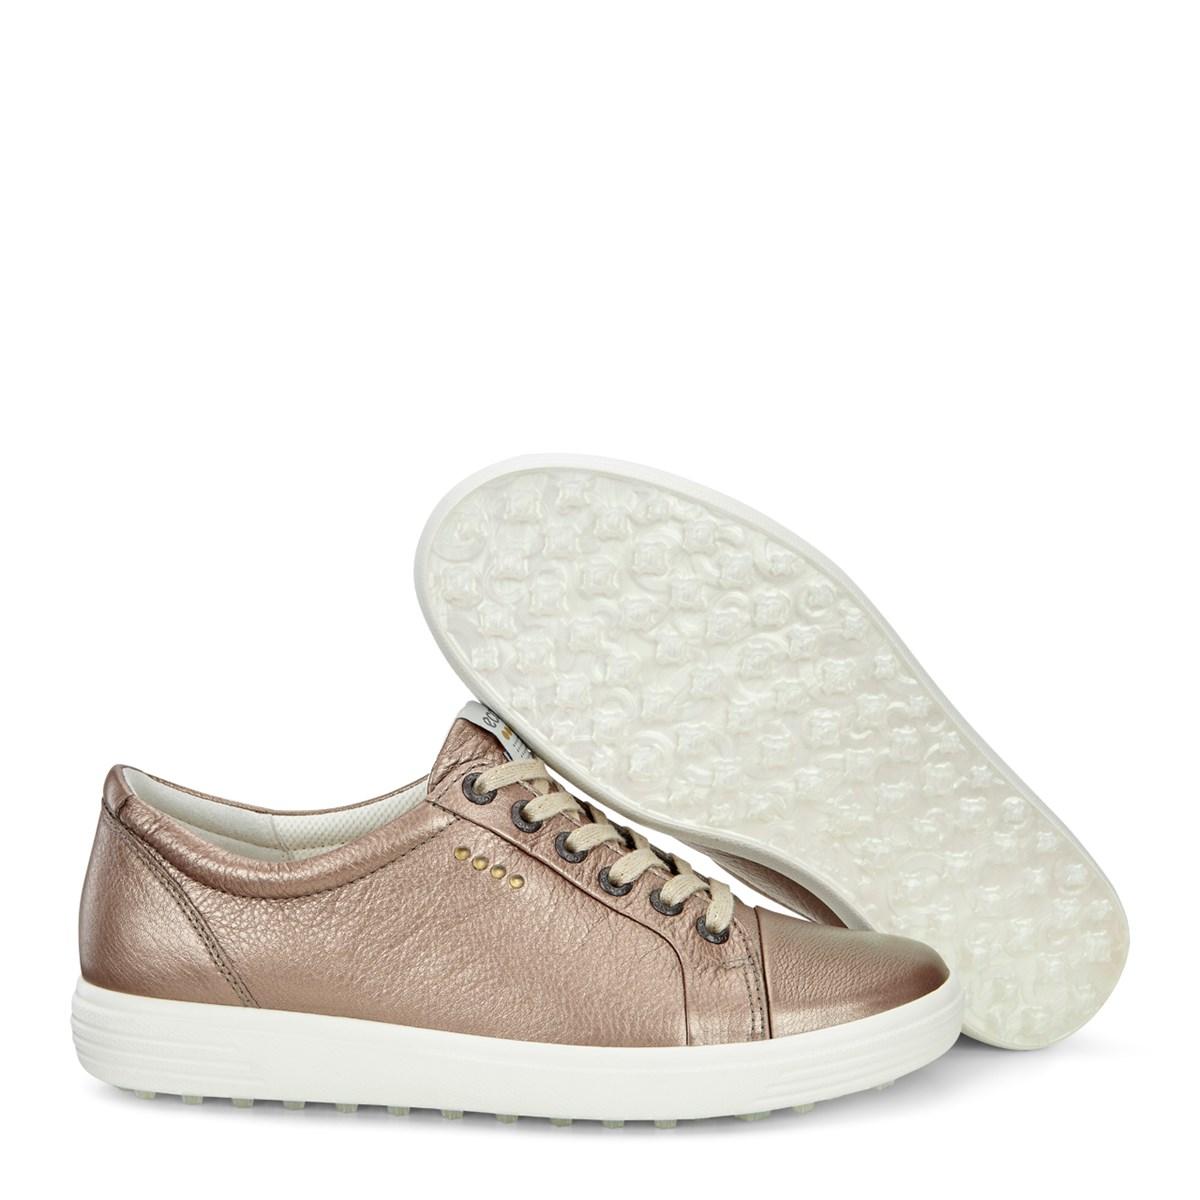 1c24932b8a Walking - GOLF CASUAL HYBRID WOMEN'S - ECCO Shoes NZ